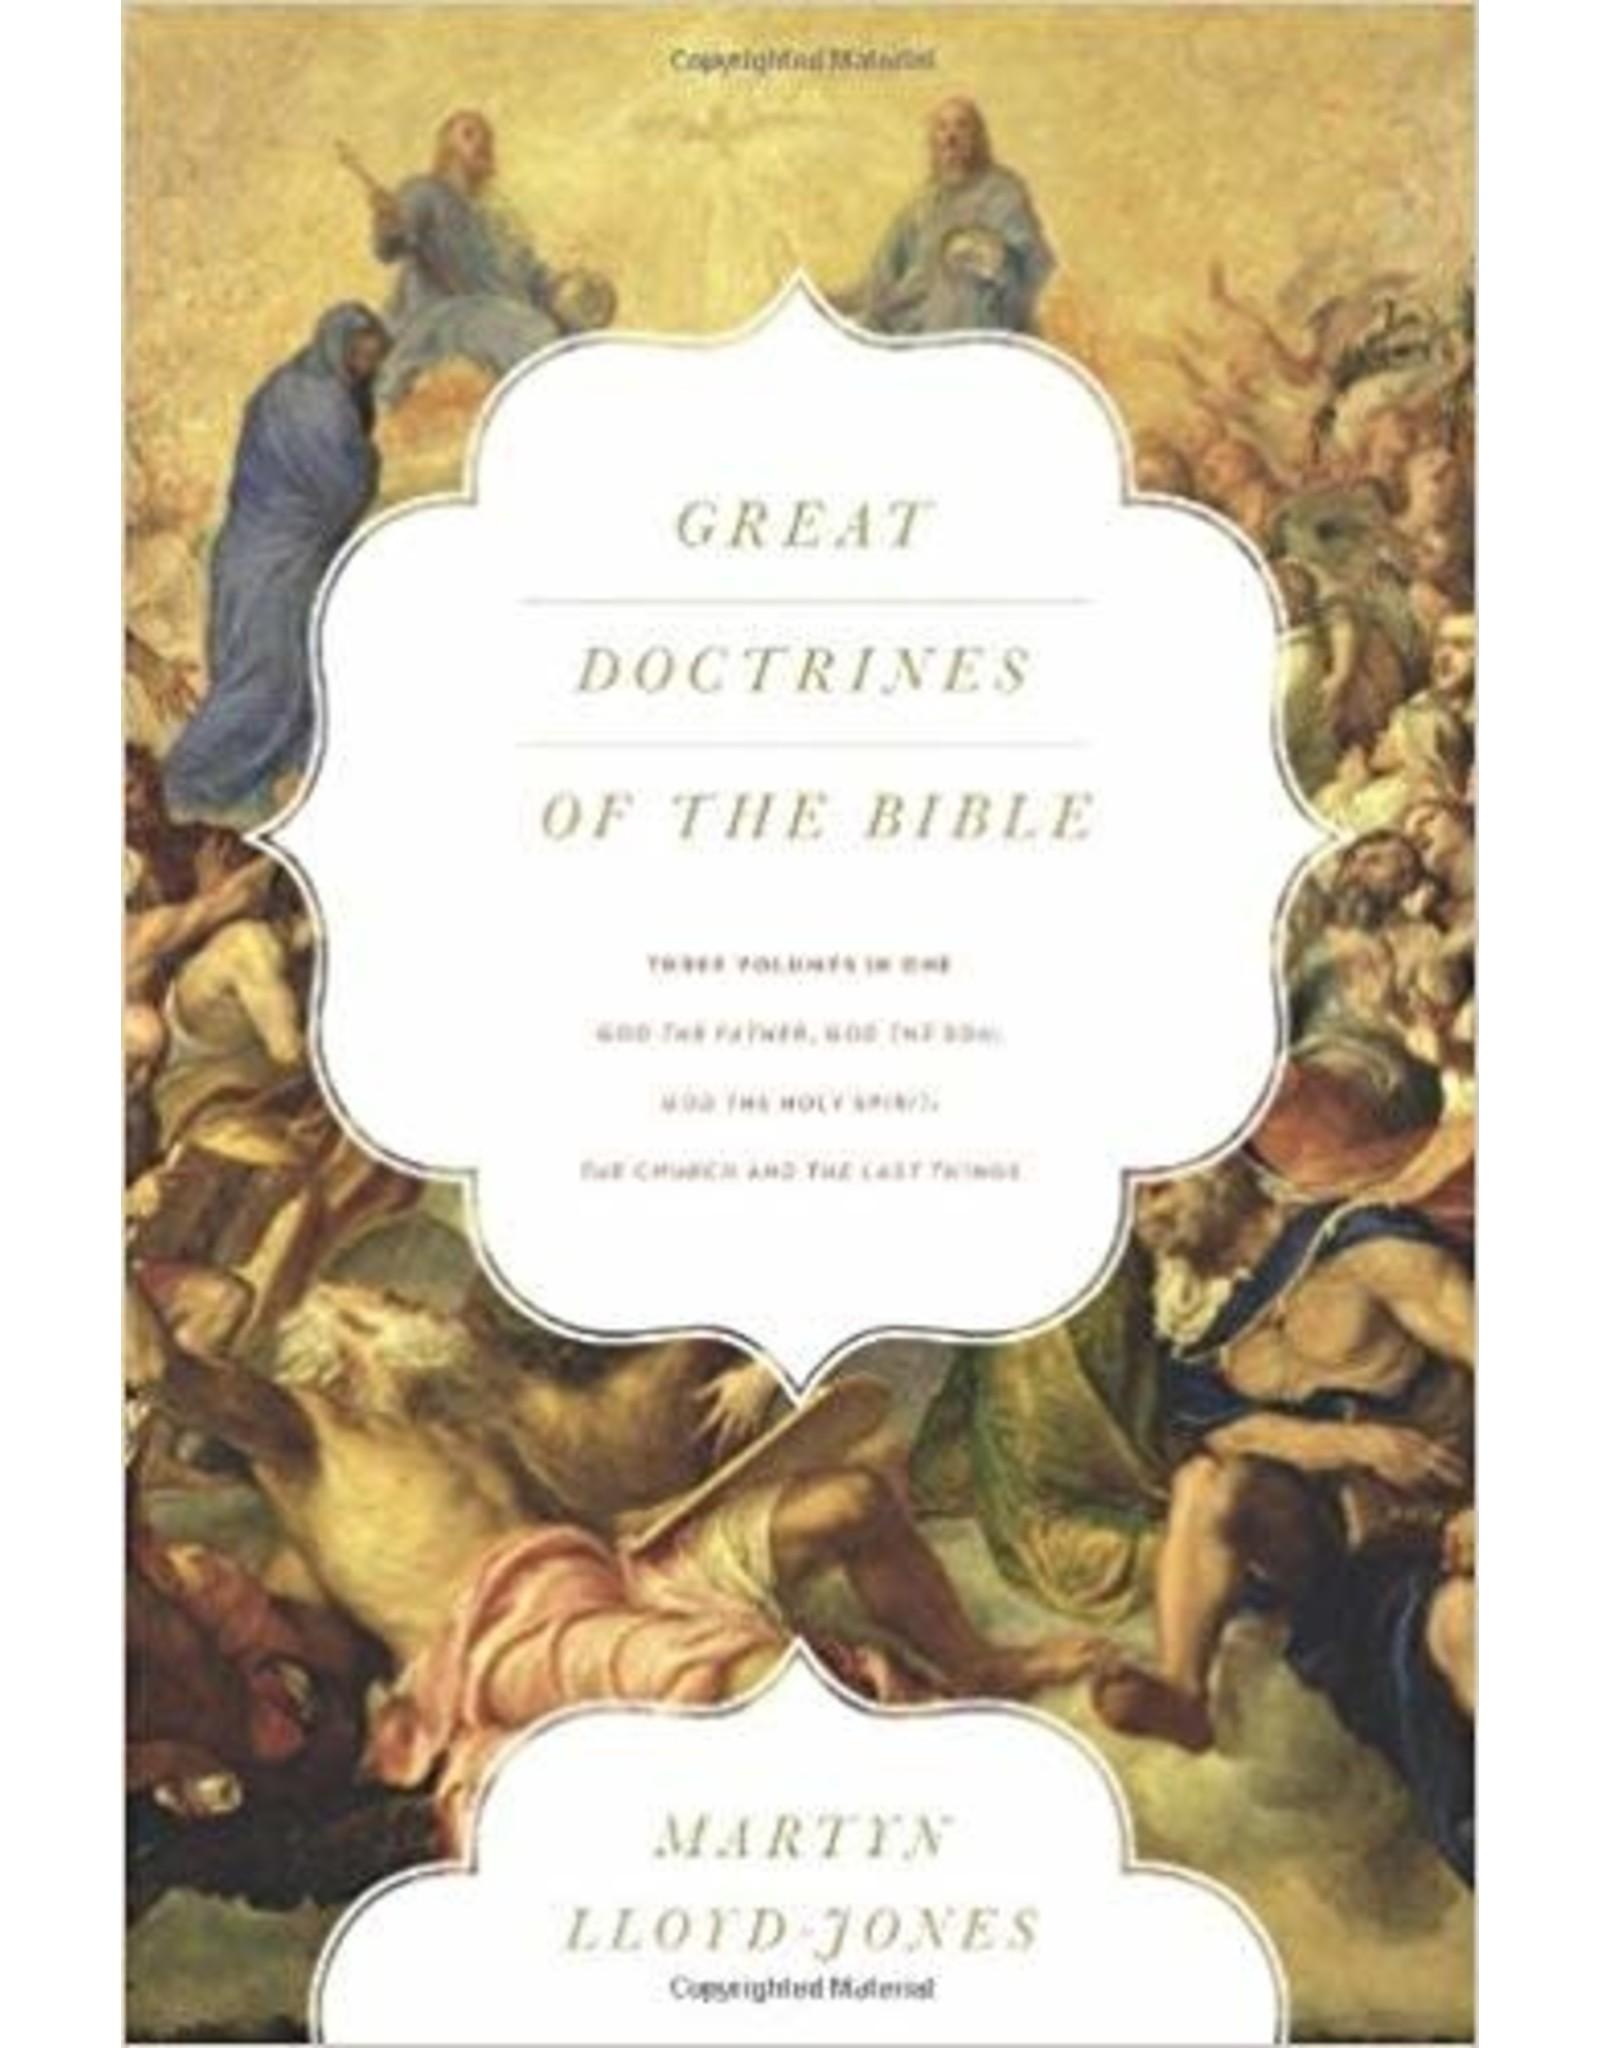 Lloyd_Jones Great Doctrines of the Bible, Three Volumes in One